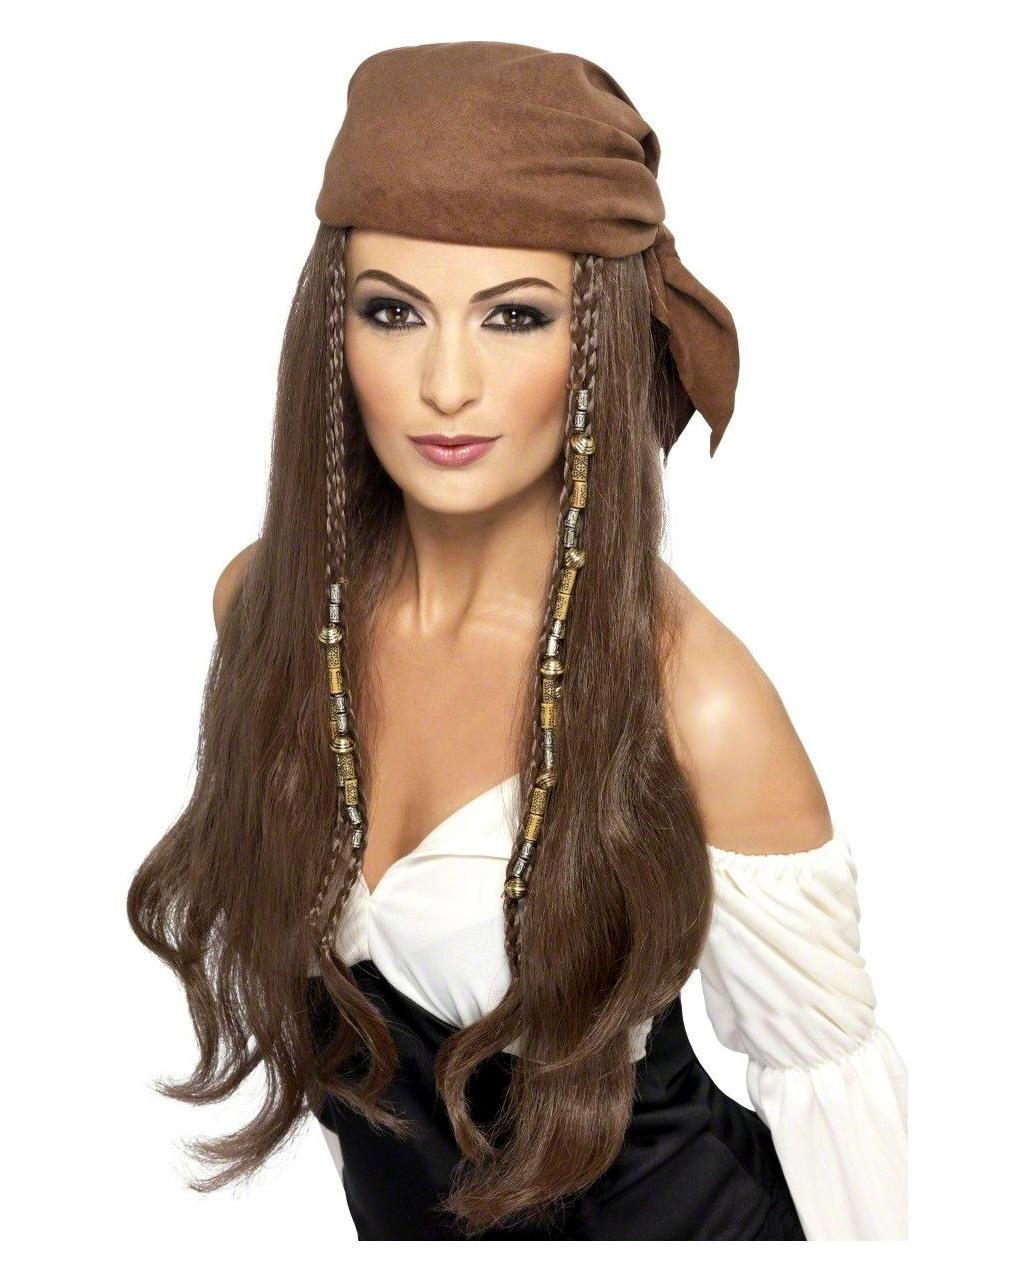 Piraten Frau Perucke Mit Kopftuch Fur Karneval Karneval Universe